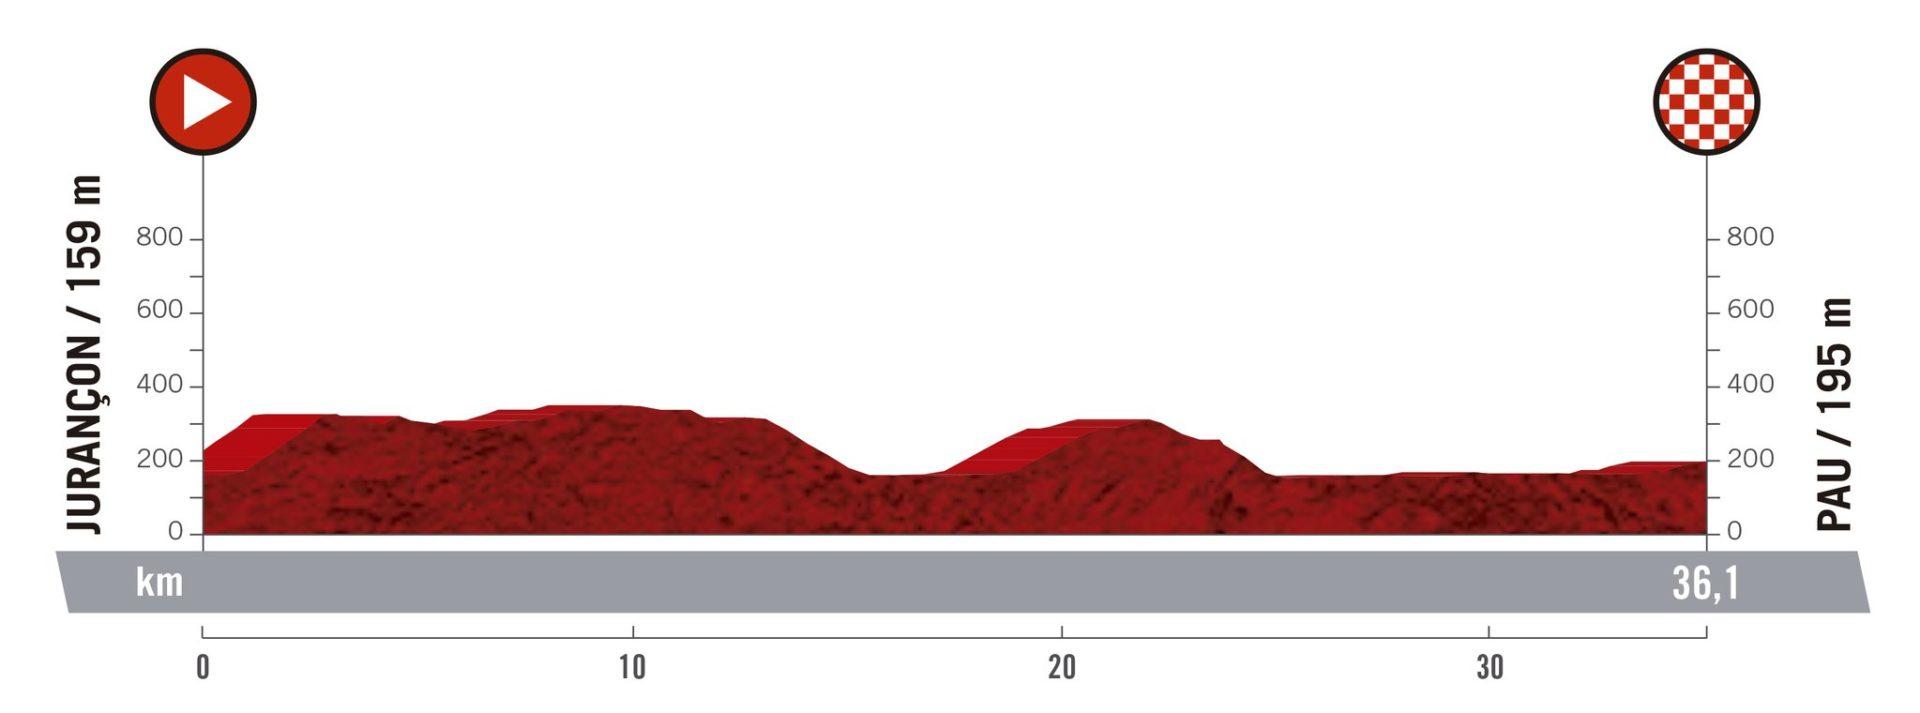 Jurançon – Pau. 36,1 kms